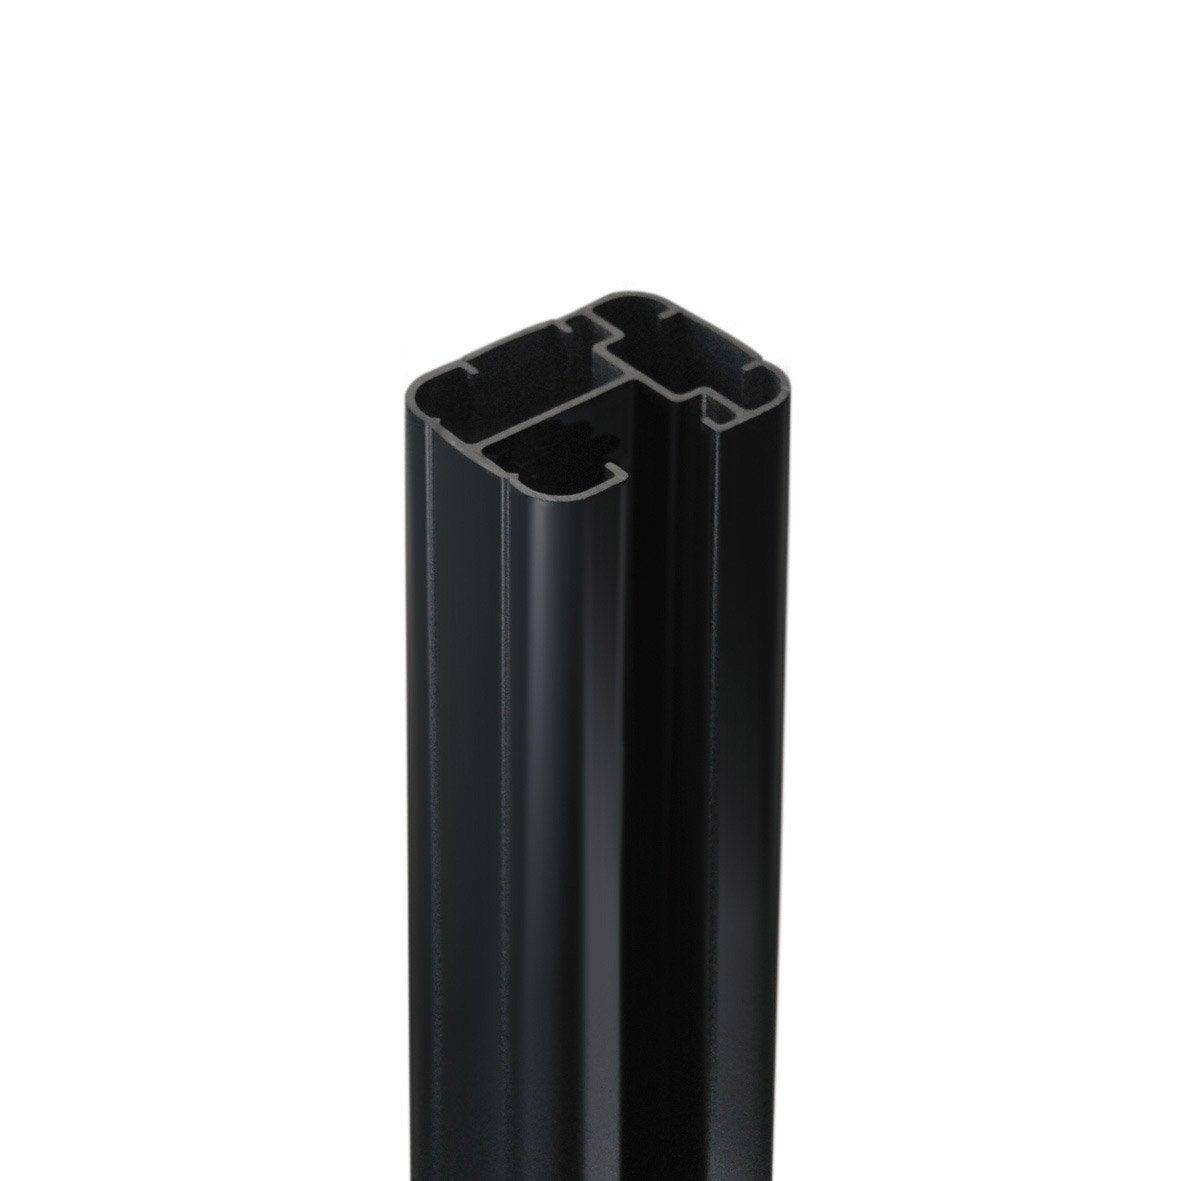 poteau aluminium sceller premium gris anthracite x x cm leroy merlin. Black Bedroom Furniture Sets. Home Design Ideas